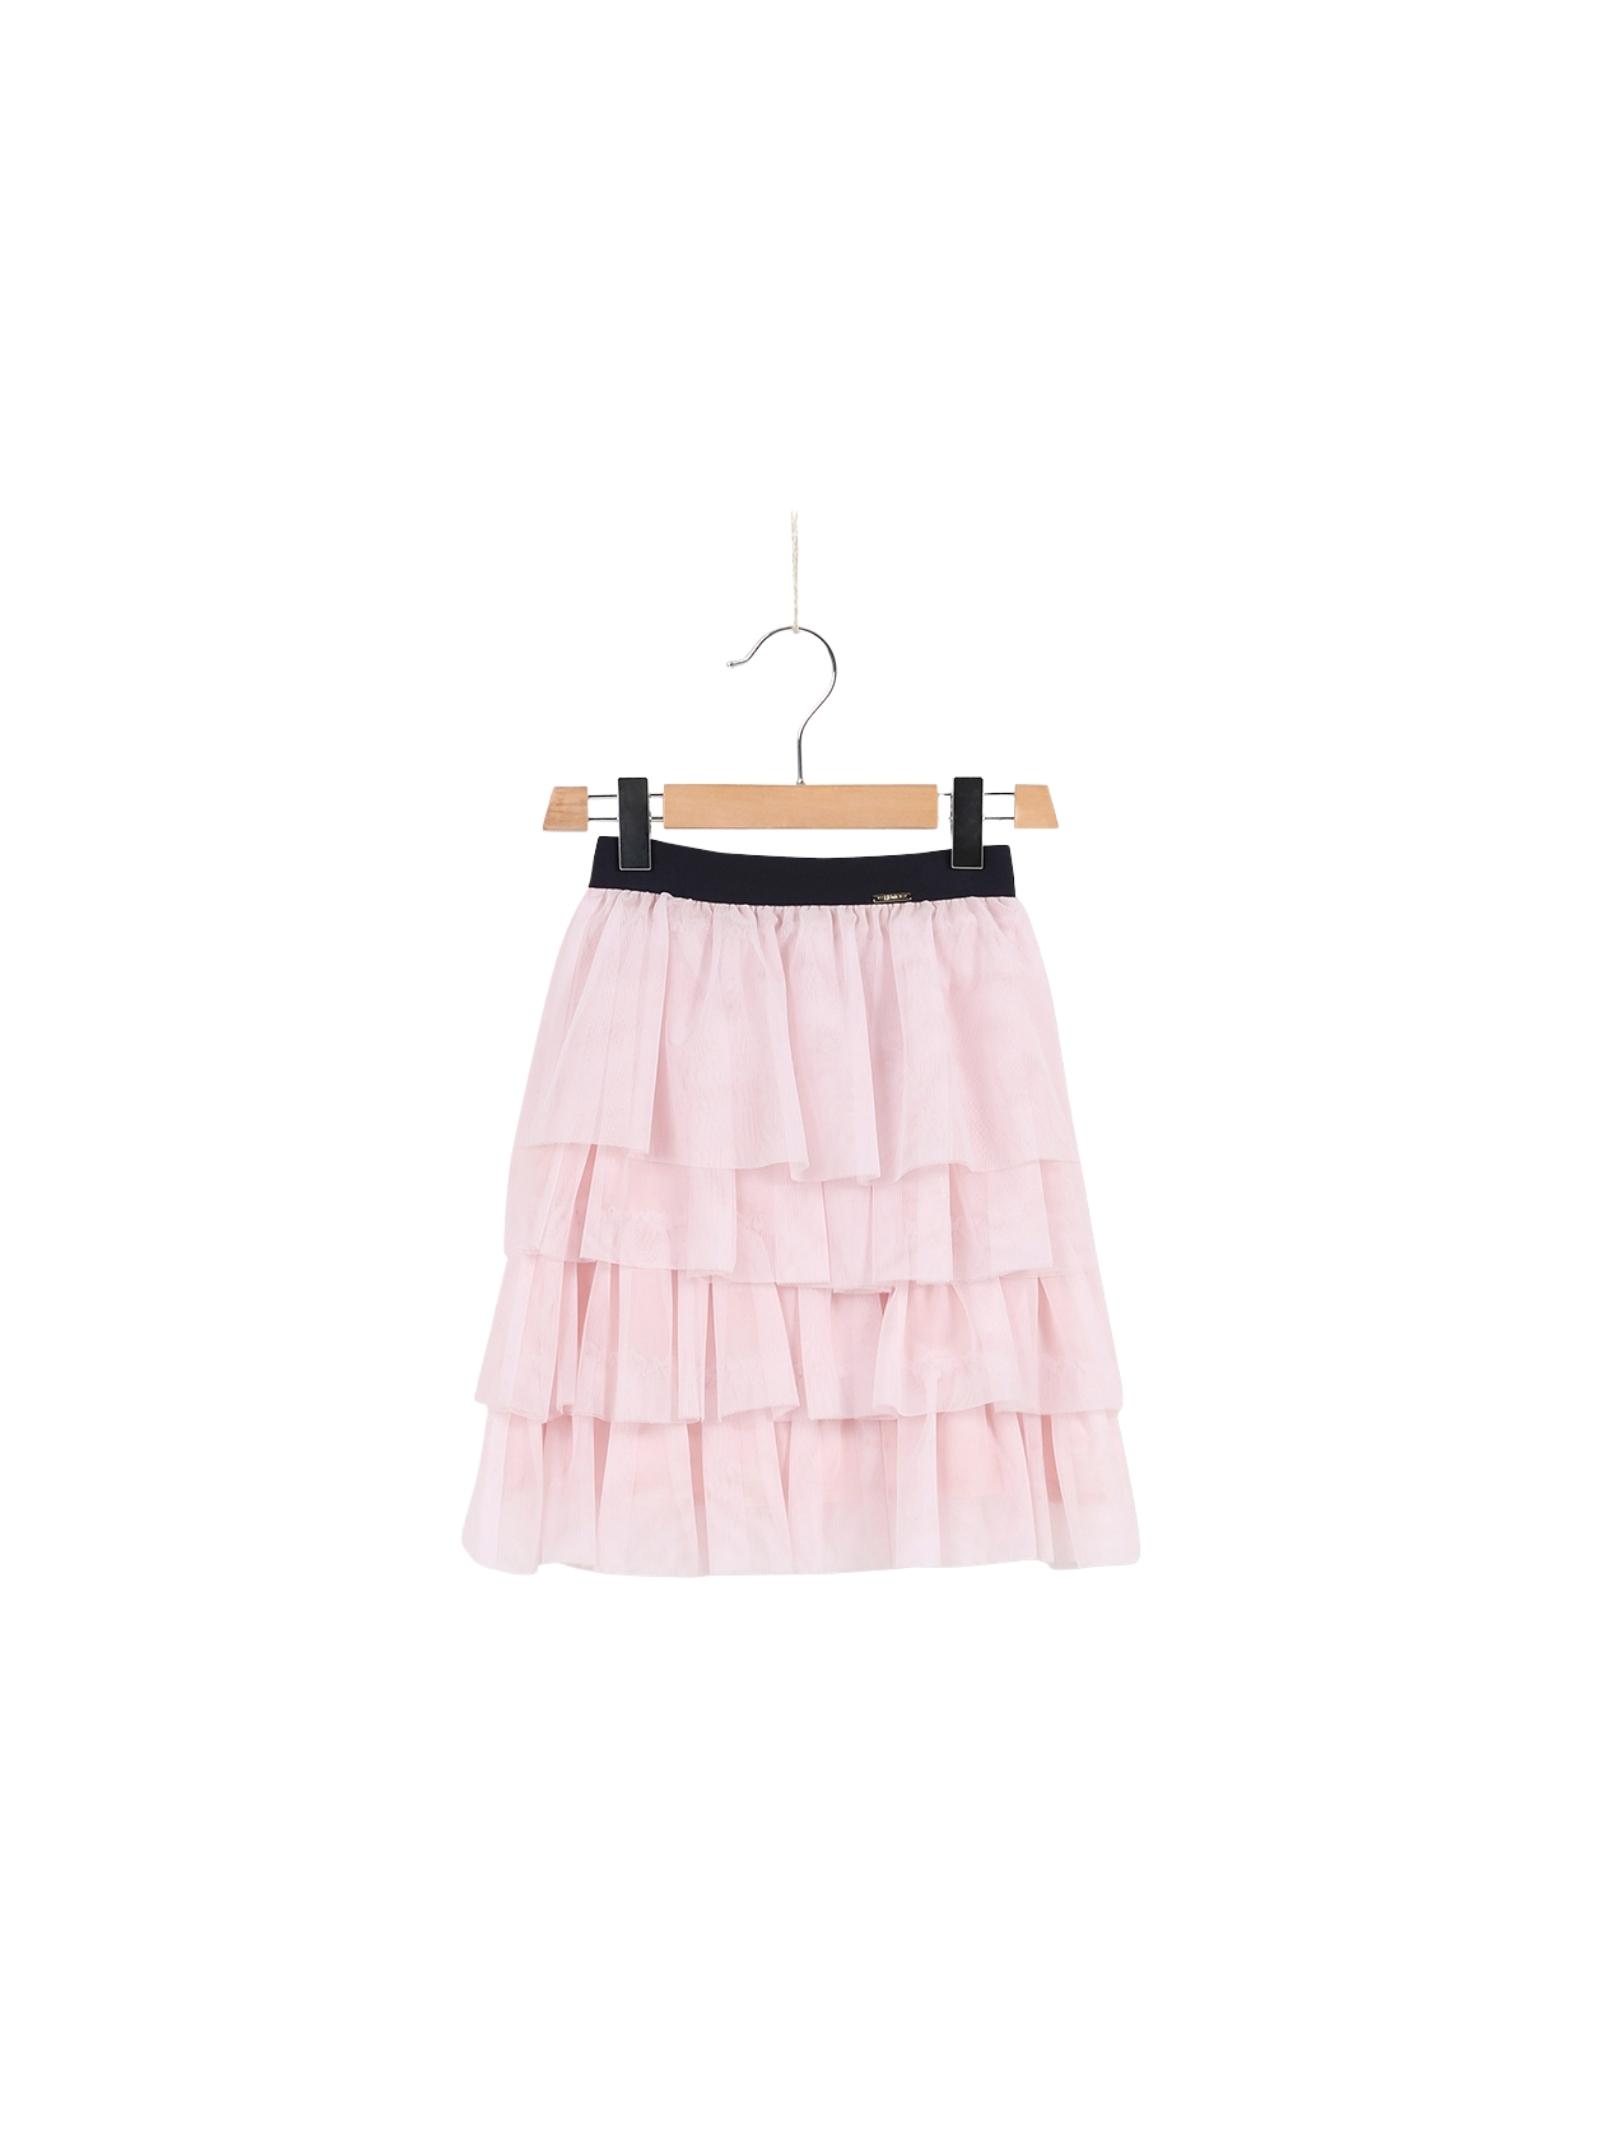 Gonna Bambina Midi Pink LIU-JO JUNIOR | Gonne | GA1015J766741309